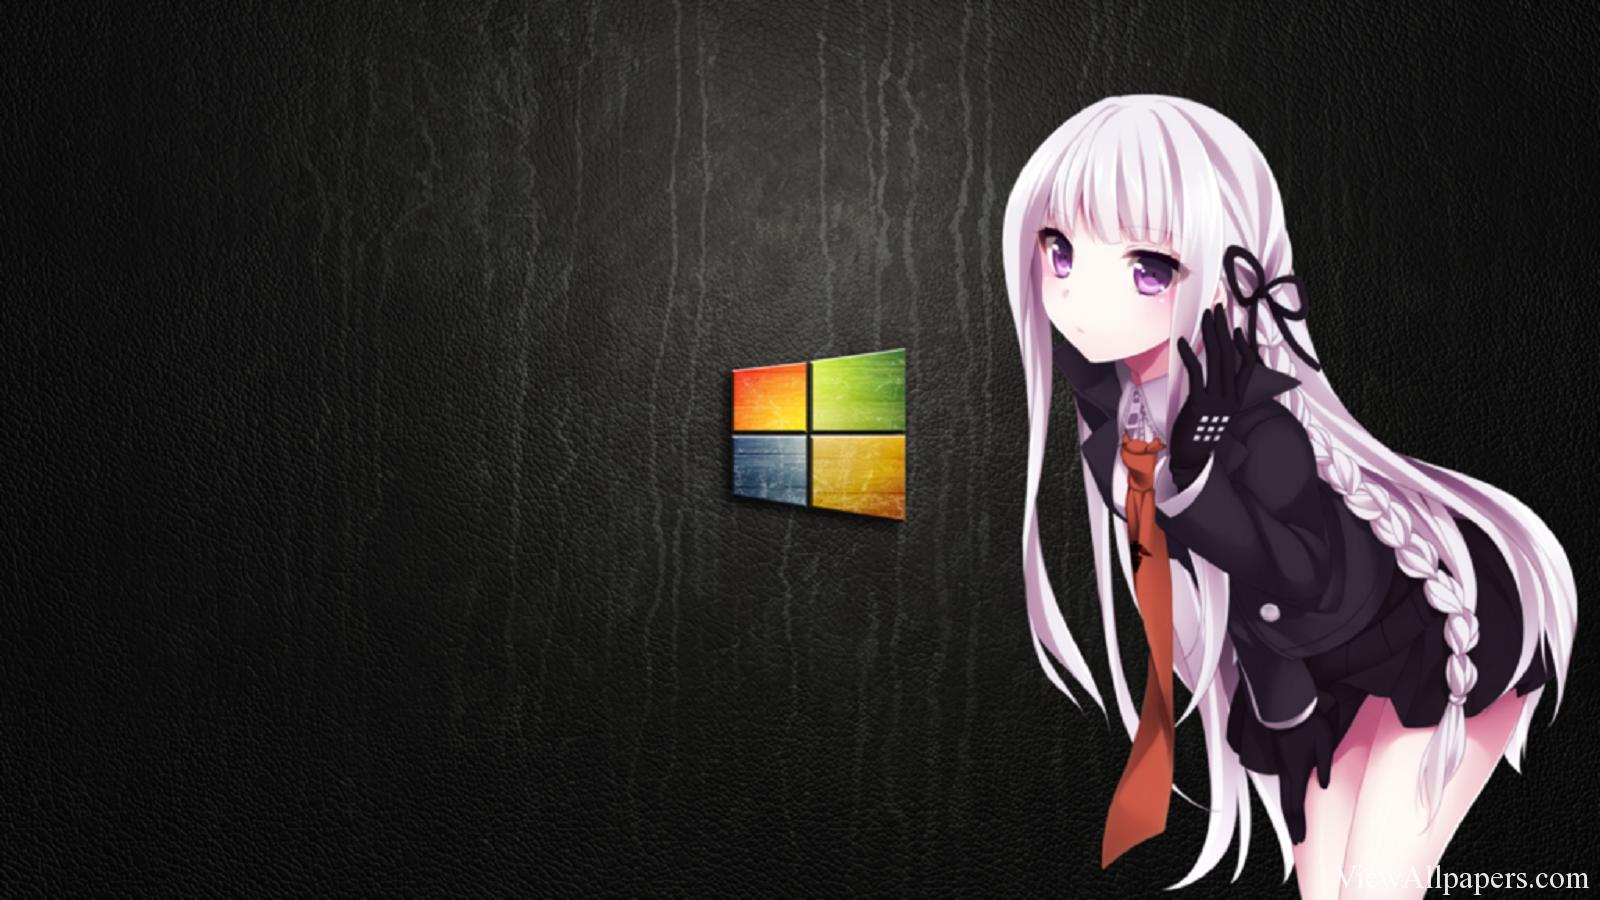 Download Wallpaper Desktop Hd Anime Hd Cikimm Com